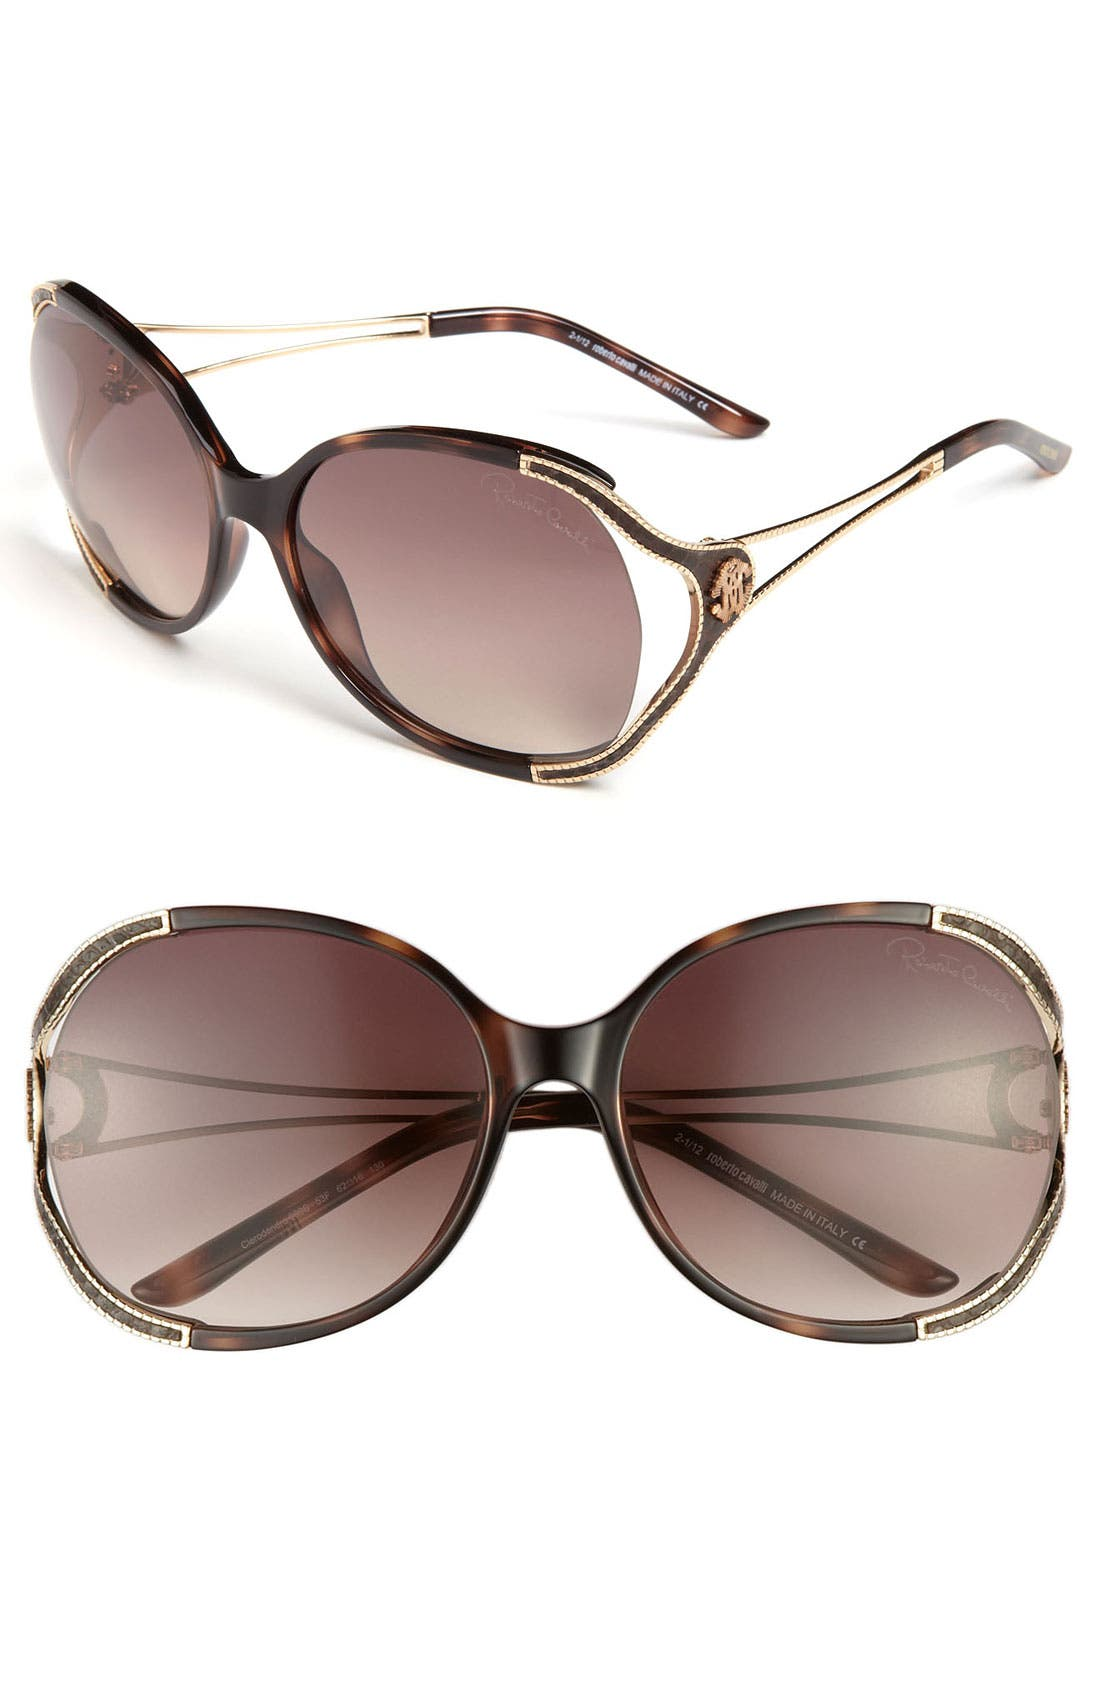 Alternate Image 1 Selected - Roberto Cavalli 62mm Oversized Sunglasses